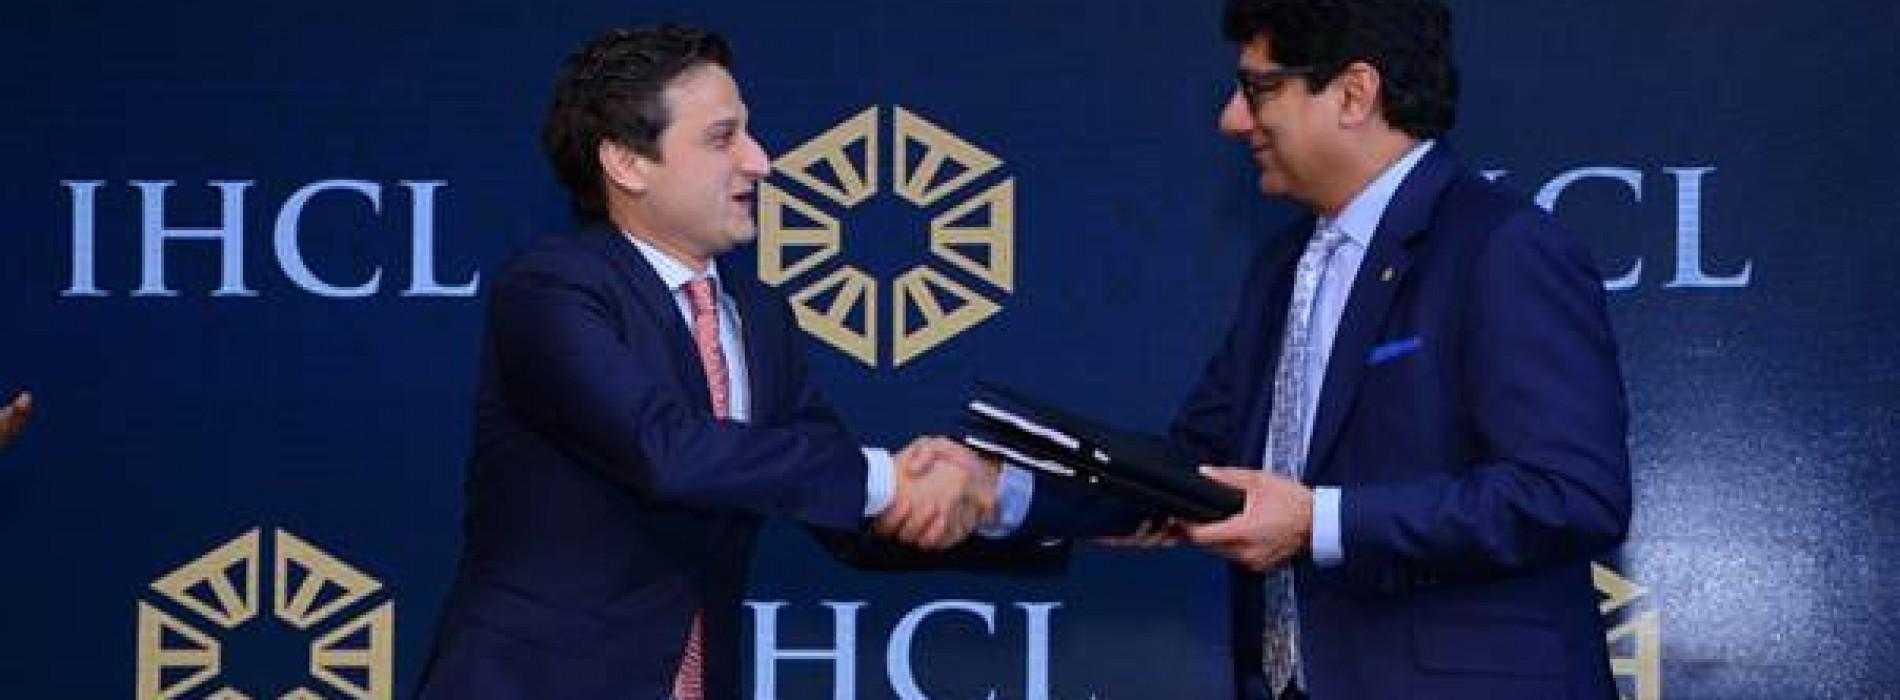 IHCL announces its first Taj in Saudi Arabia